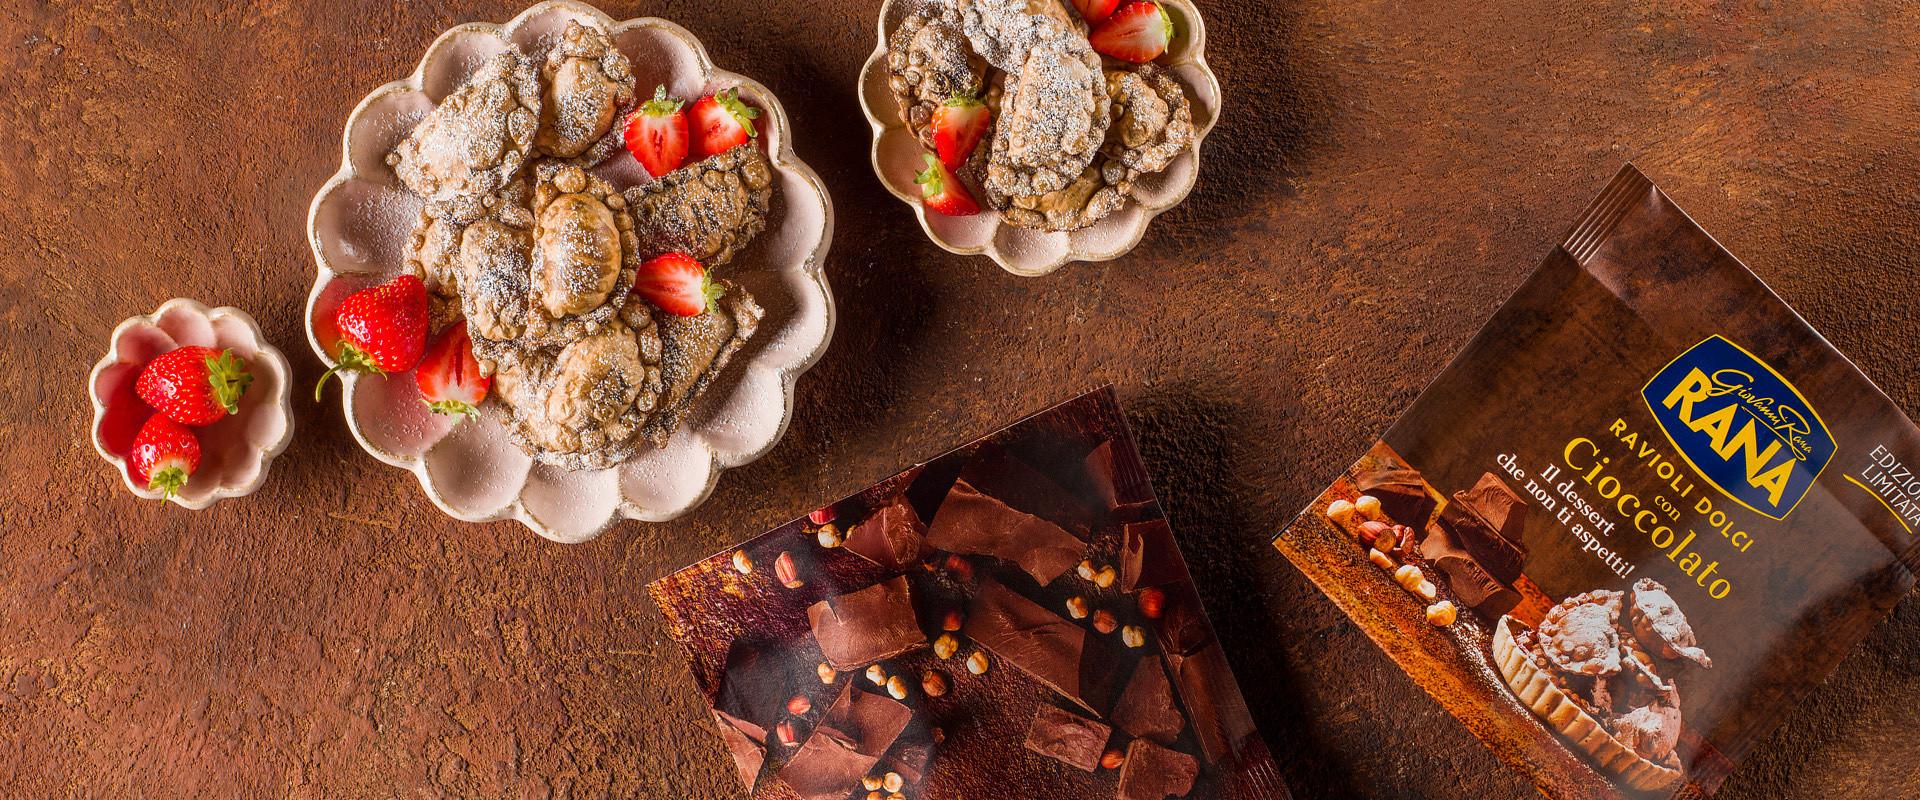 IT-ricette-ravioli-cioccolato-fragole-D.jpg